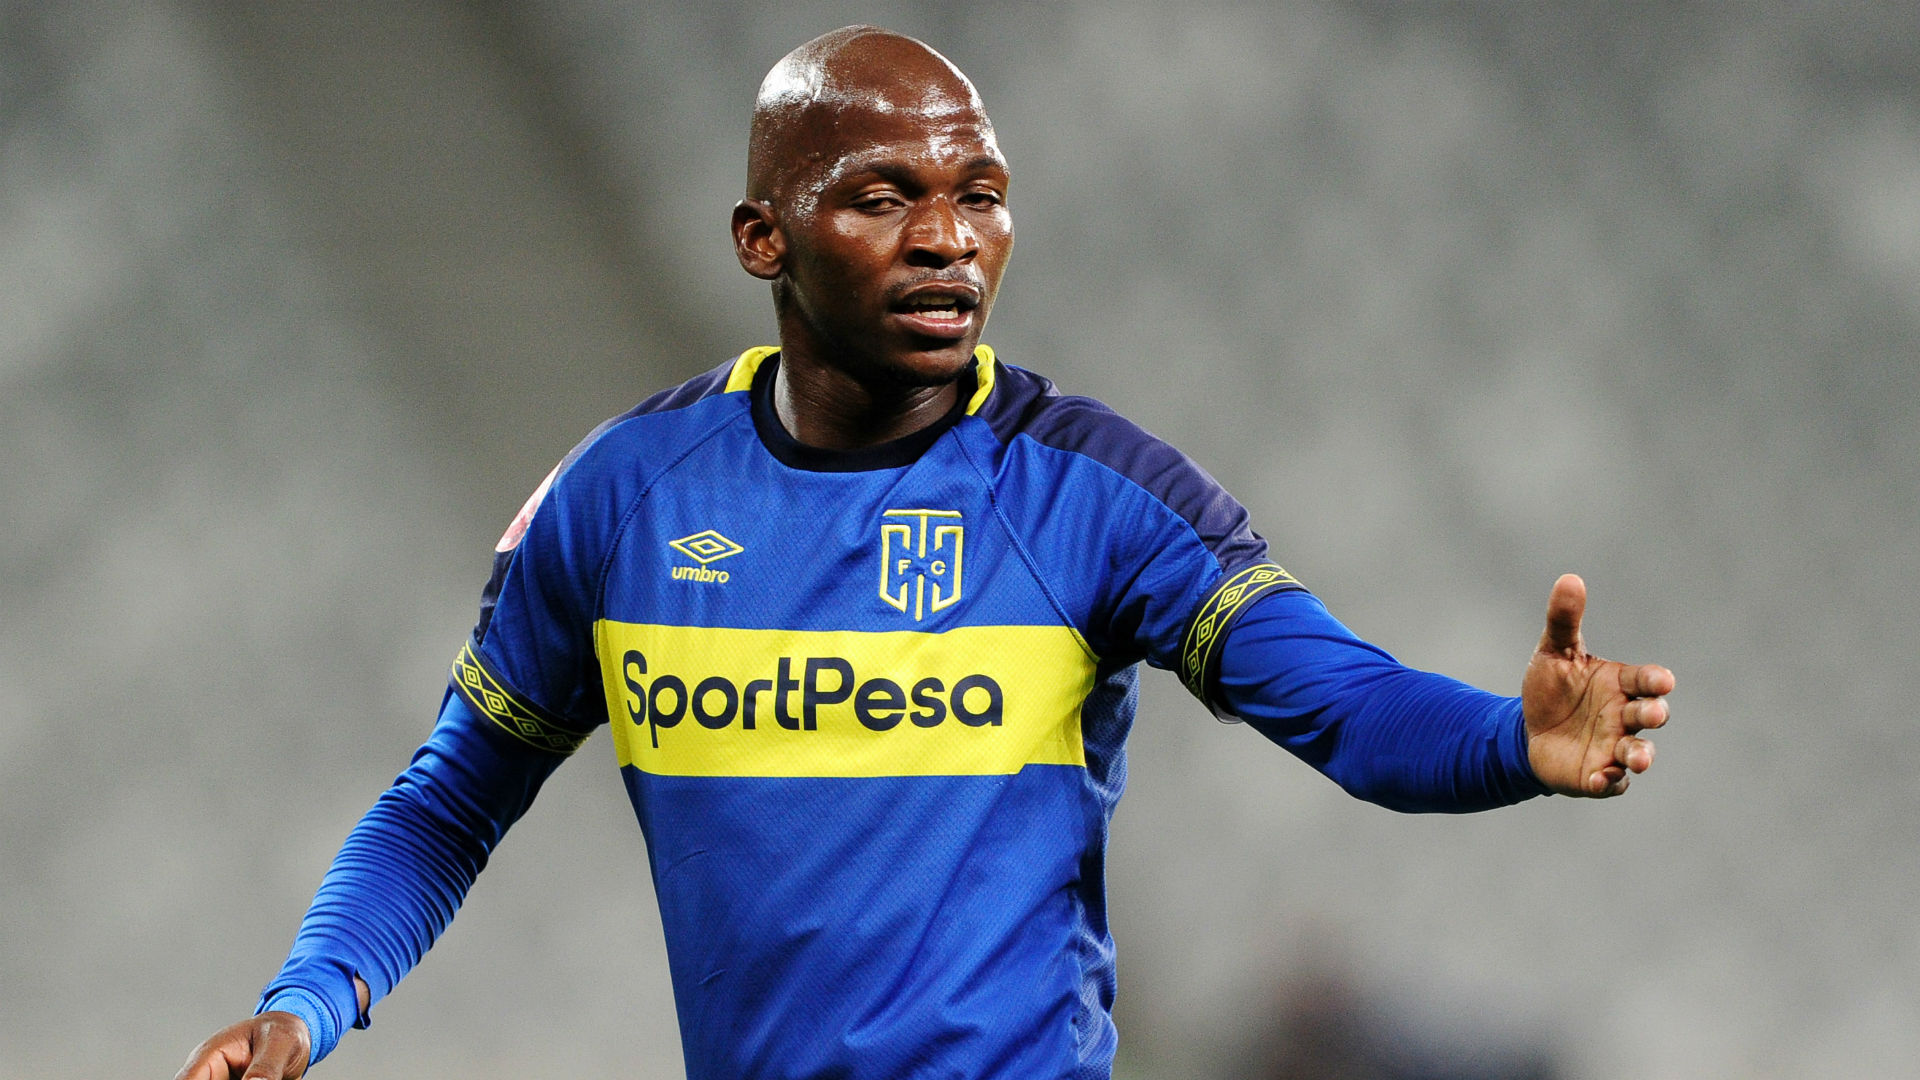 Thamsanqa Mkhize, Cape Town City, April 2019